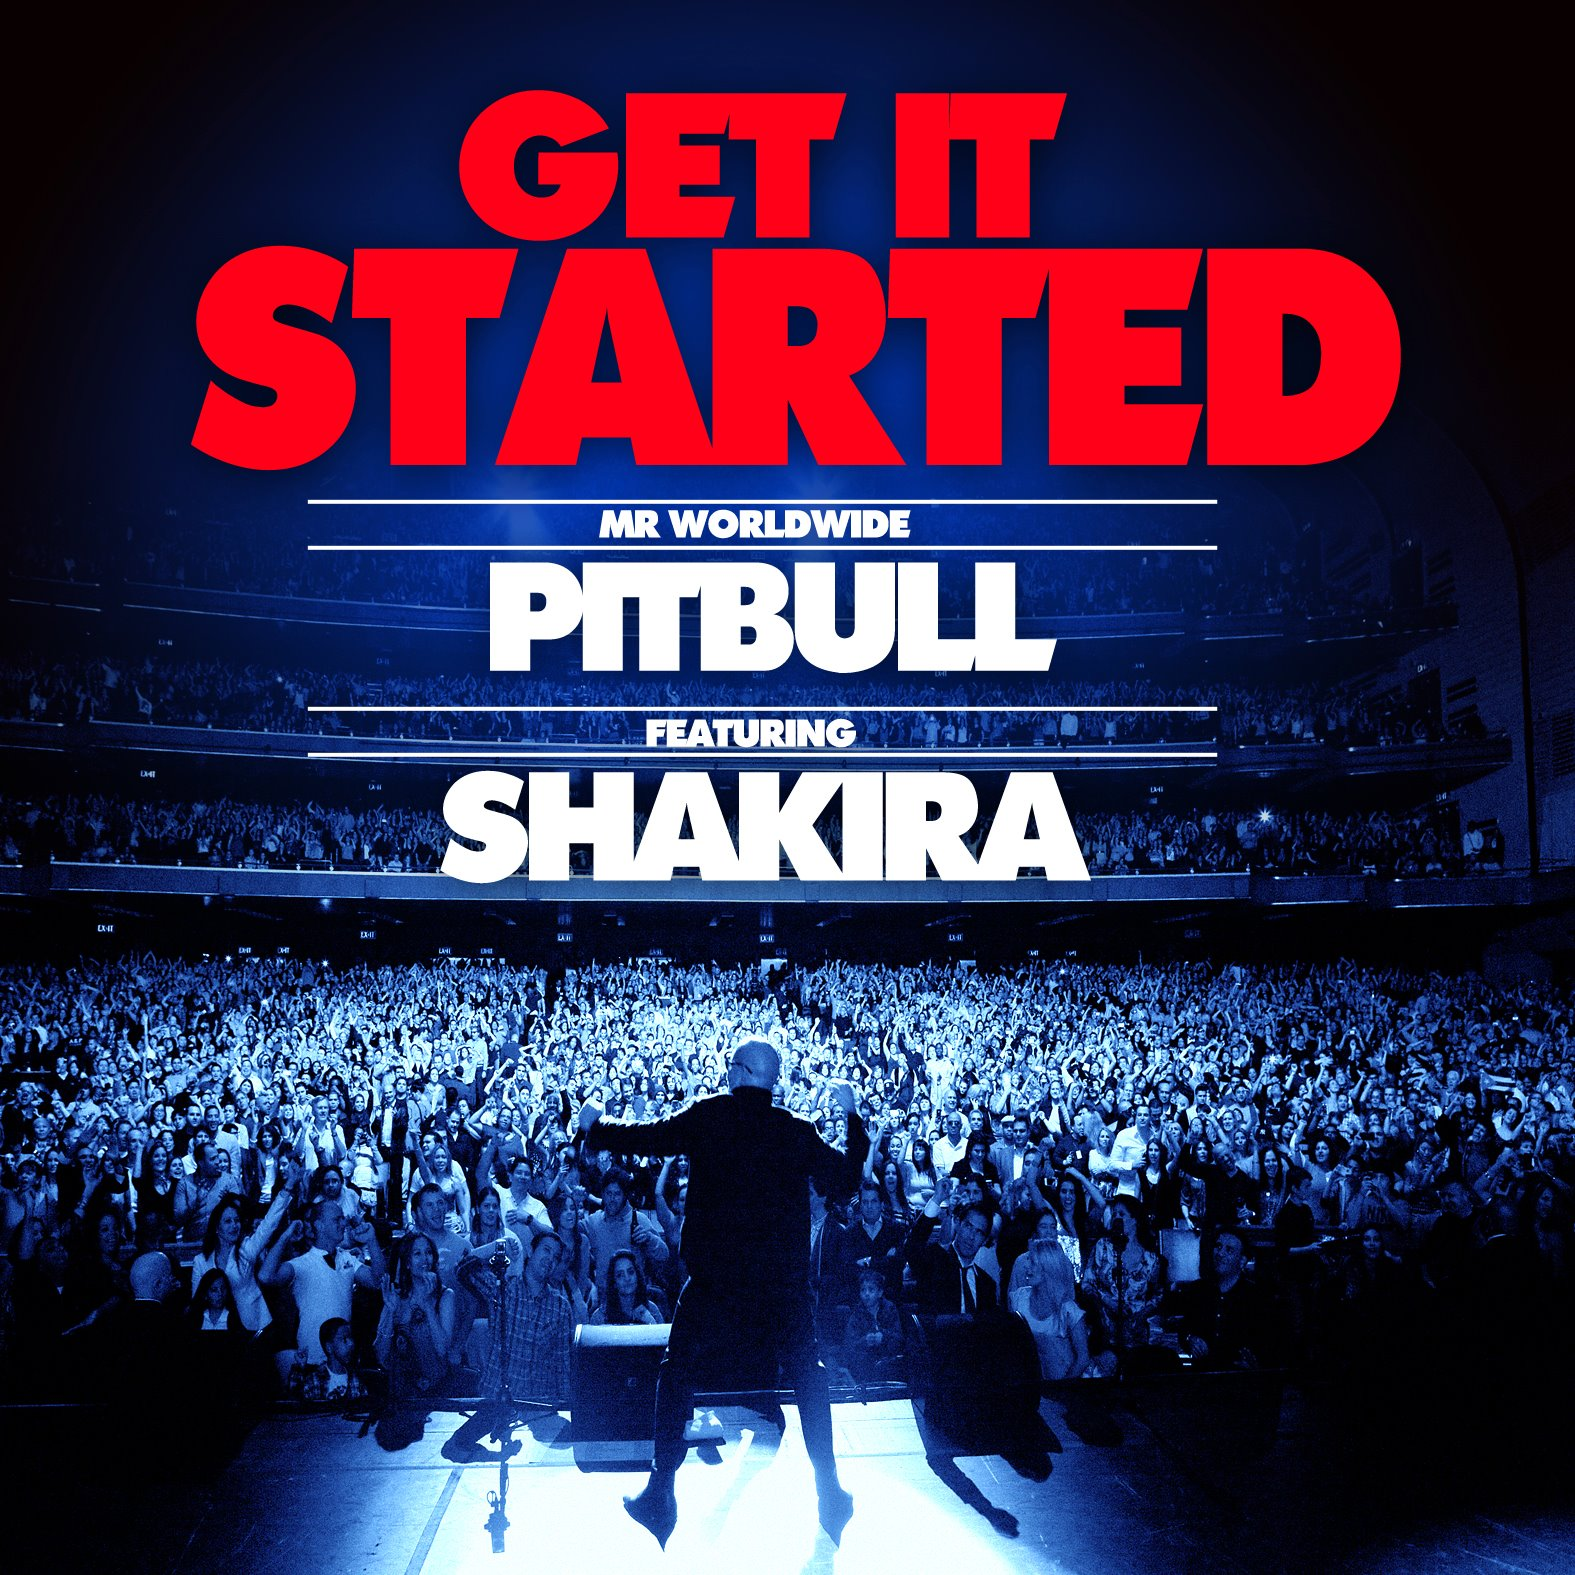 get started shakira y pitbull descargar musica